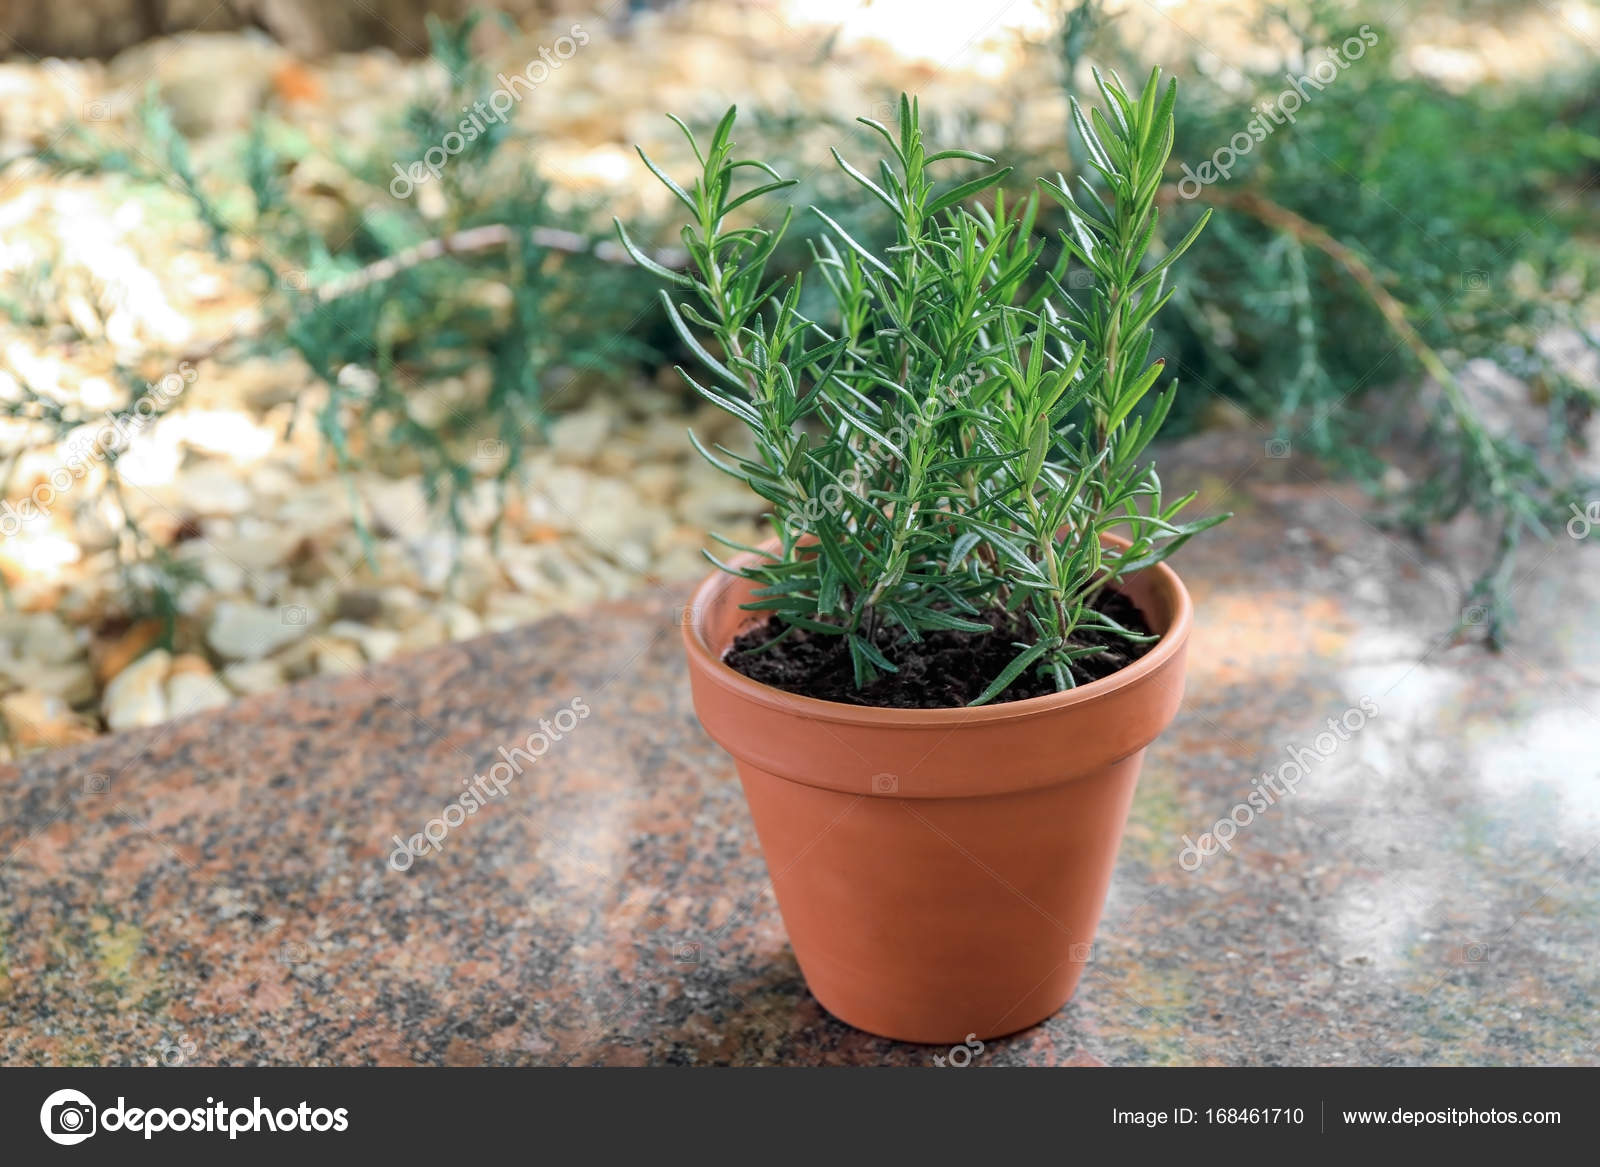 Topf Mit Rosmarin Im Garten Stockfoto Belchonock 168461710